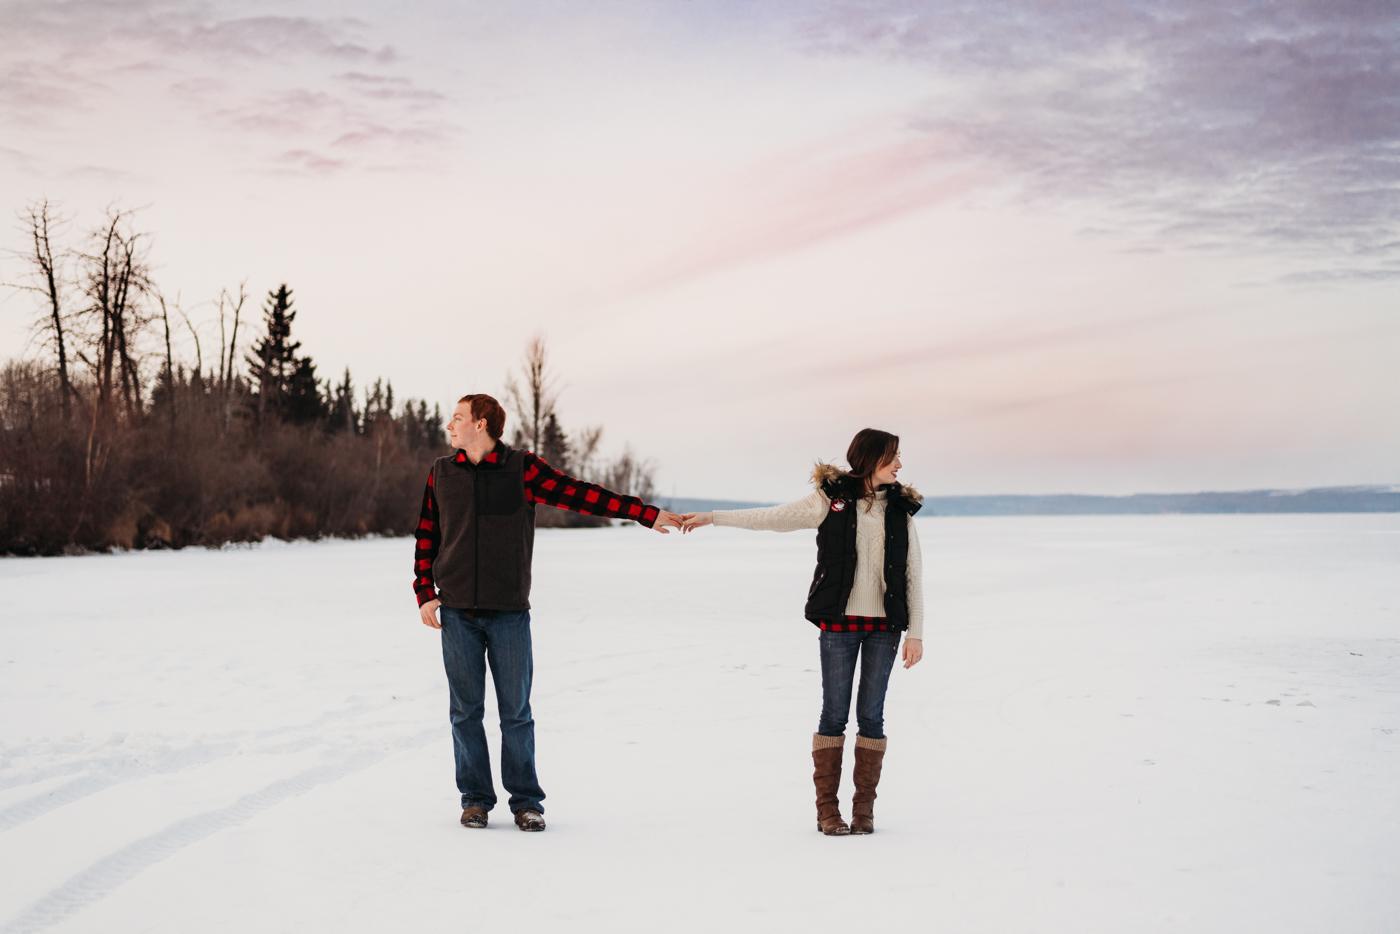 FortSt.John_photographer_TyraEPhotography_Wedding_Couple_Family_Photograhy_DawsonCreek_Elopement_Bride_Boduoir_Portraits-7640.jpg